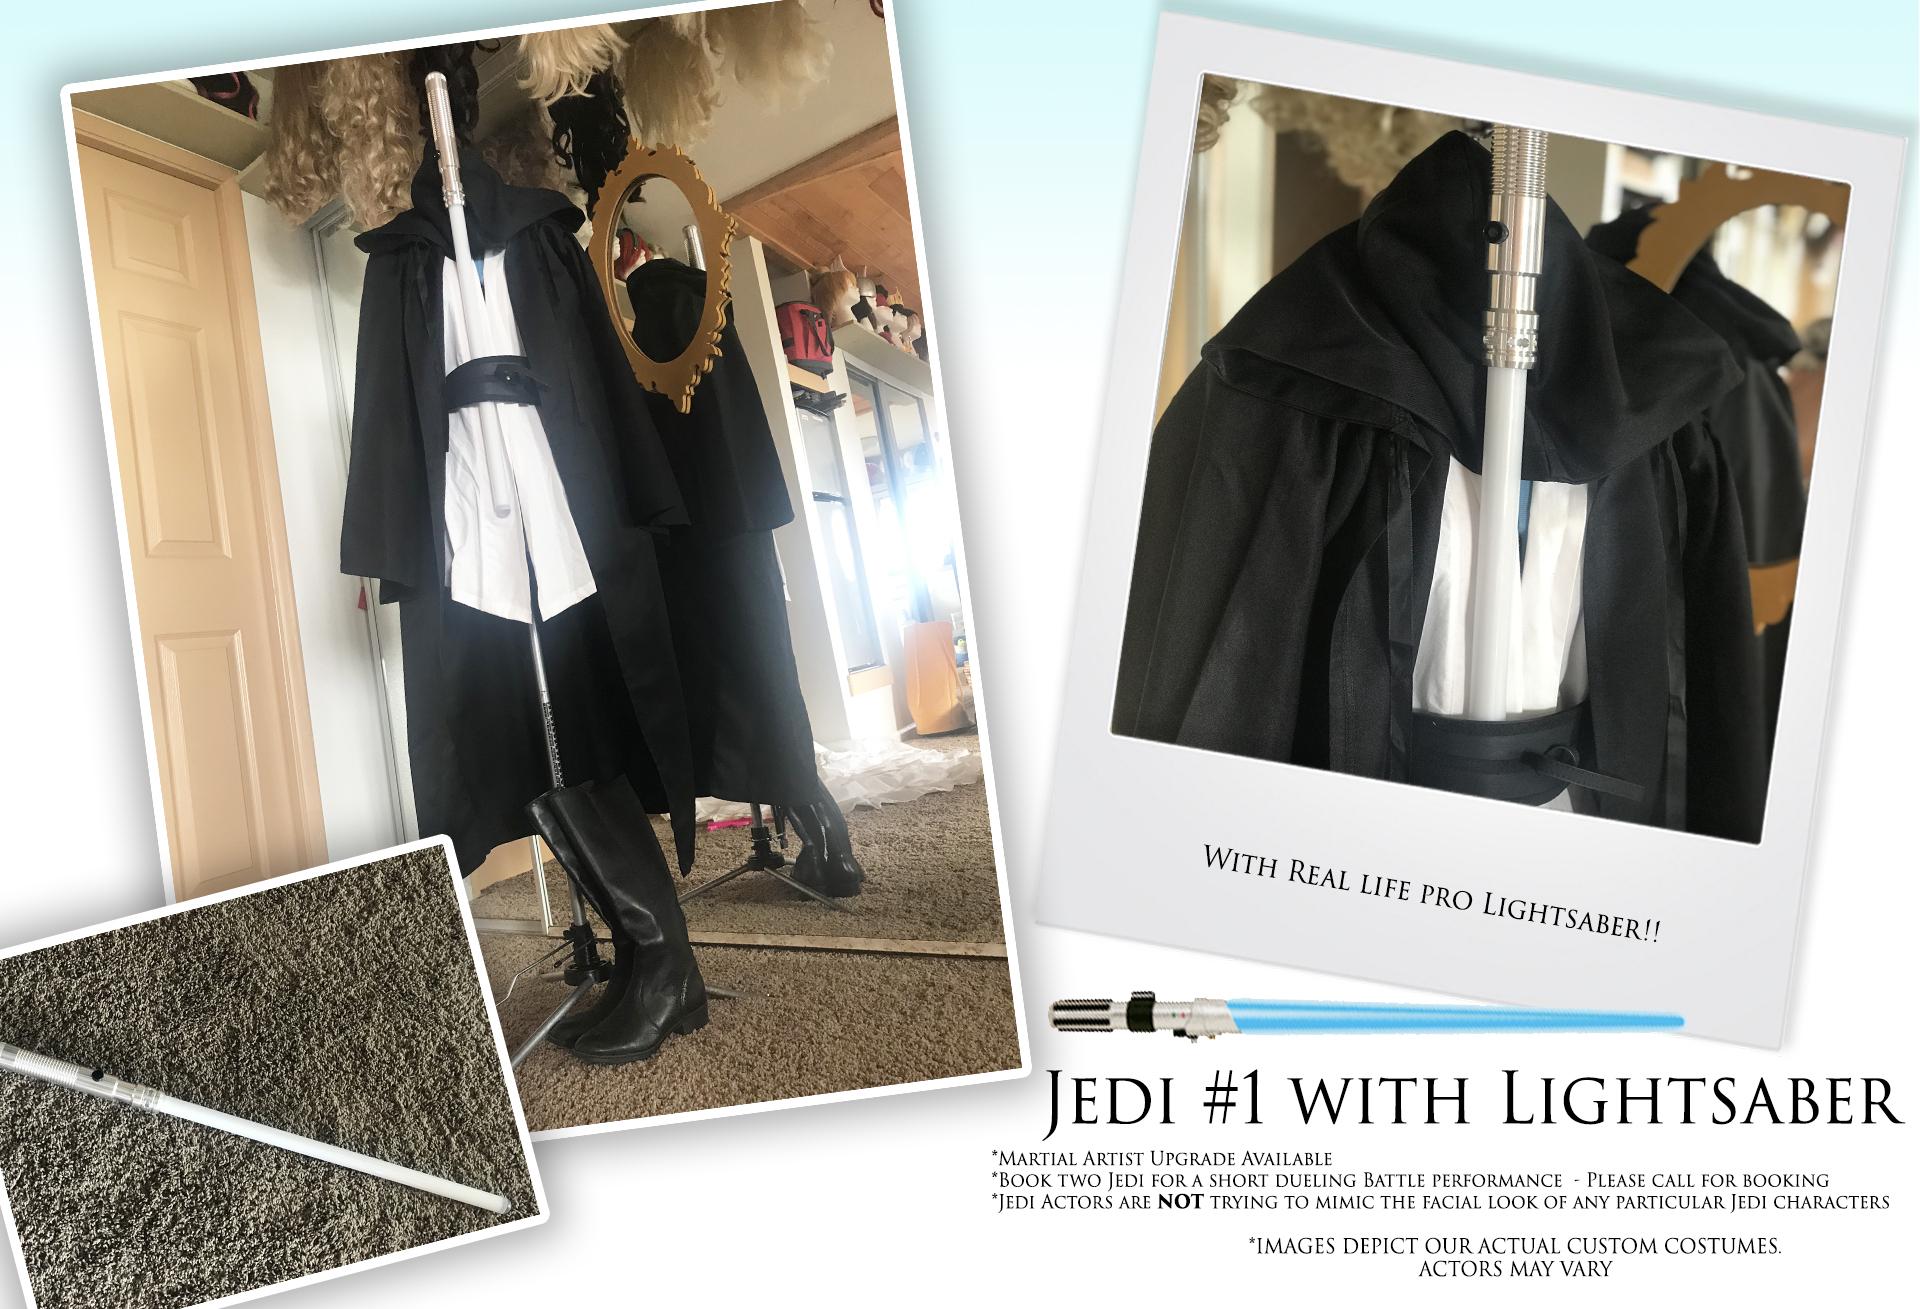 Jedi #1 with Lightsaber